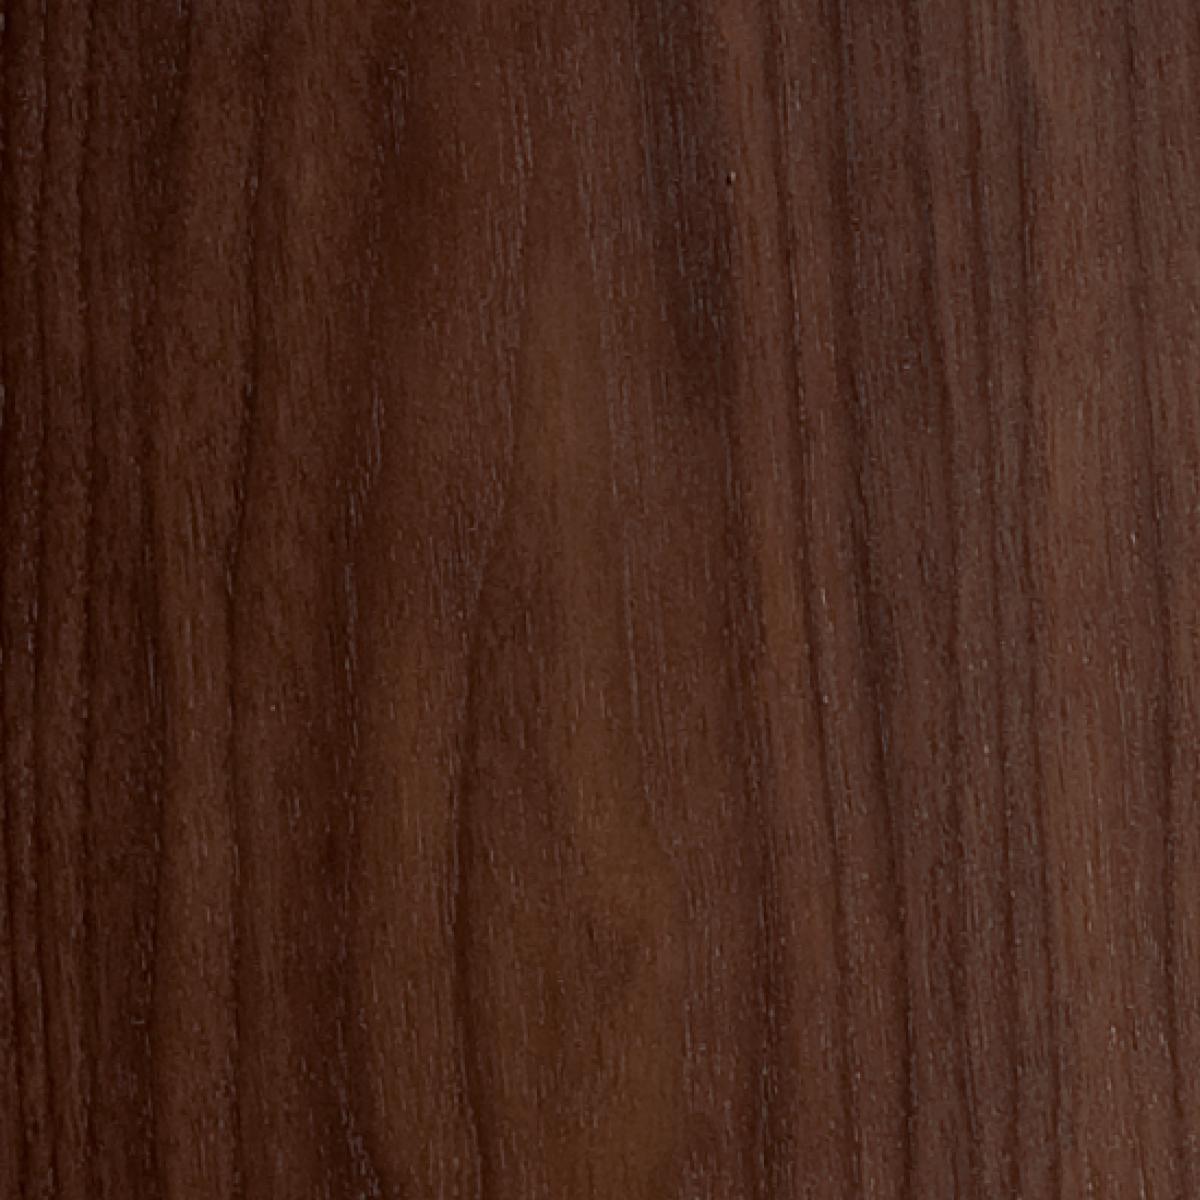 Chocolate Stained Walnut